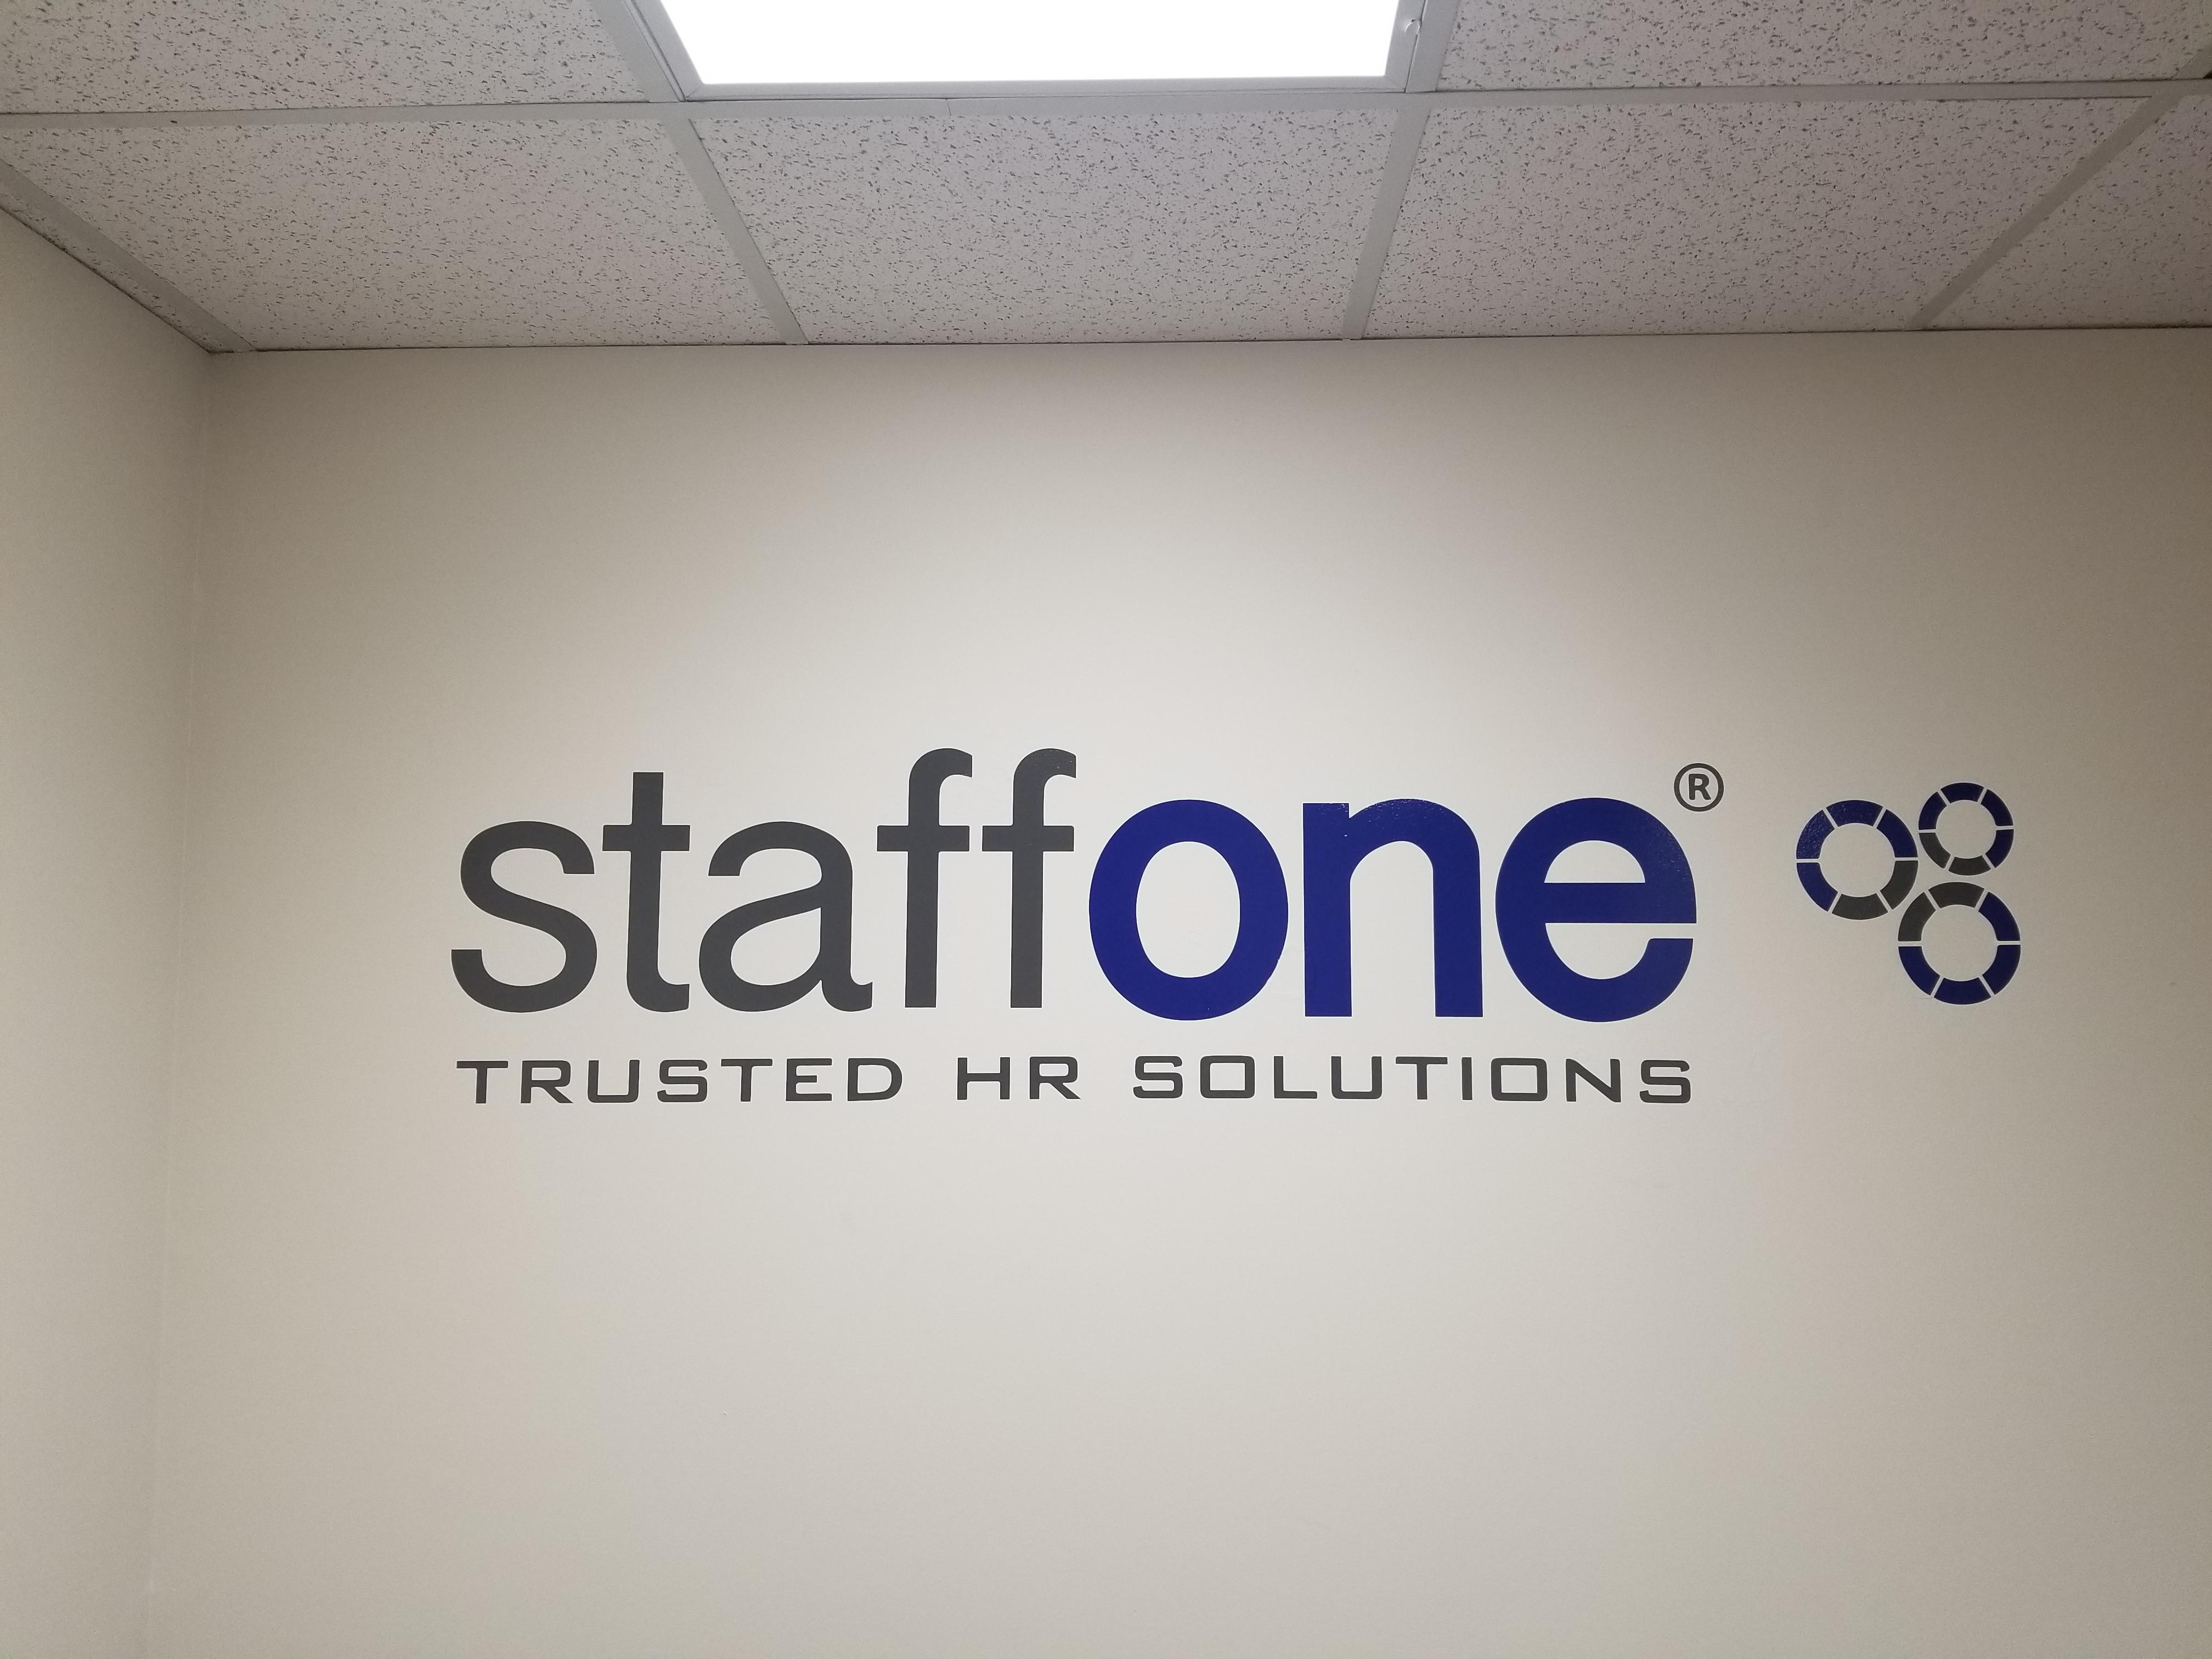 Staff One HR image 2